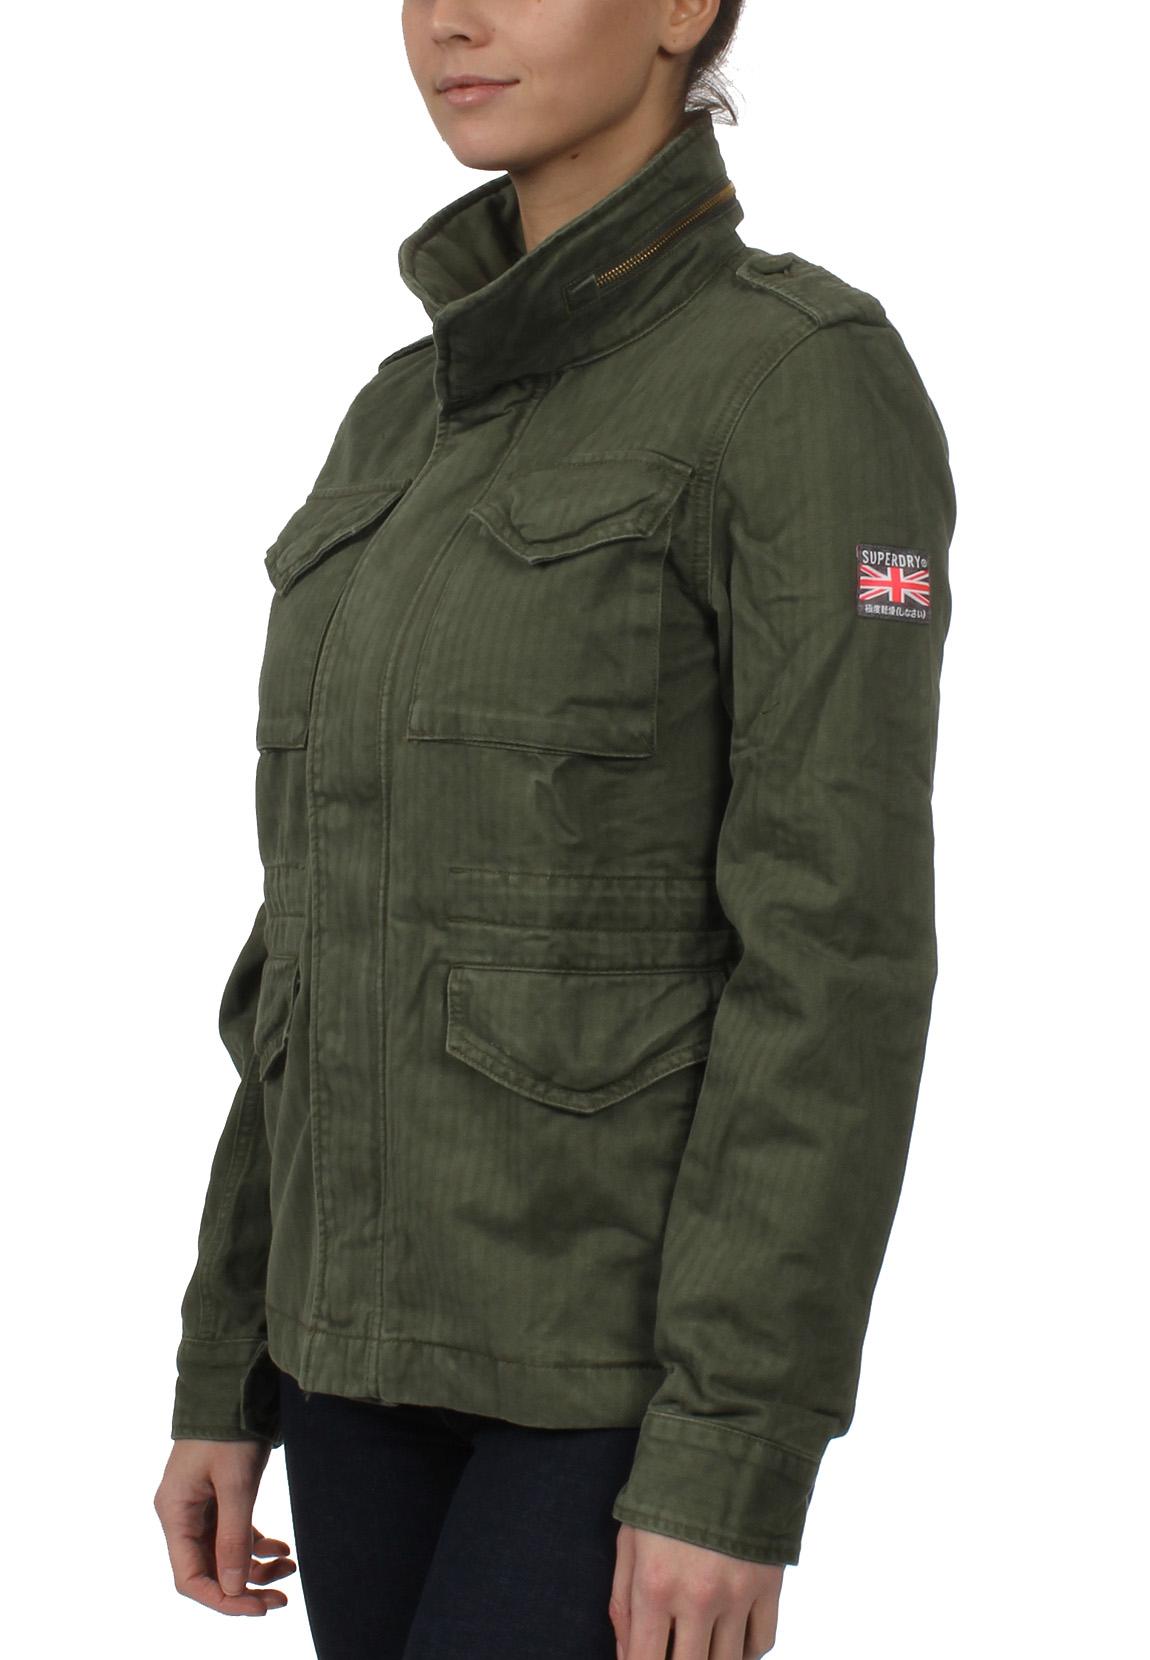 superdry jacke damen rookie classic military jacket troop khaki damen jacken m ntel. Black Bedroom Furniture Sets. Home Design Ideas